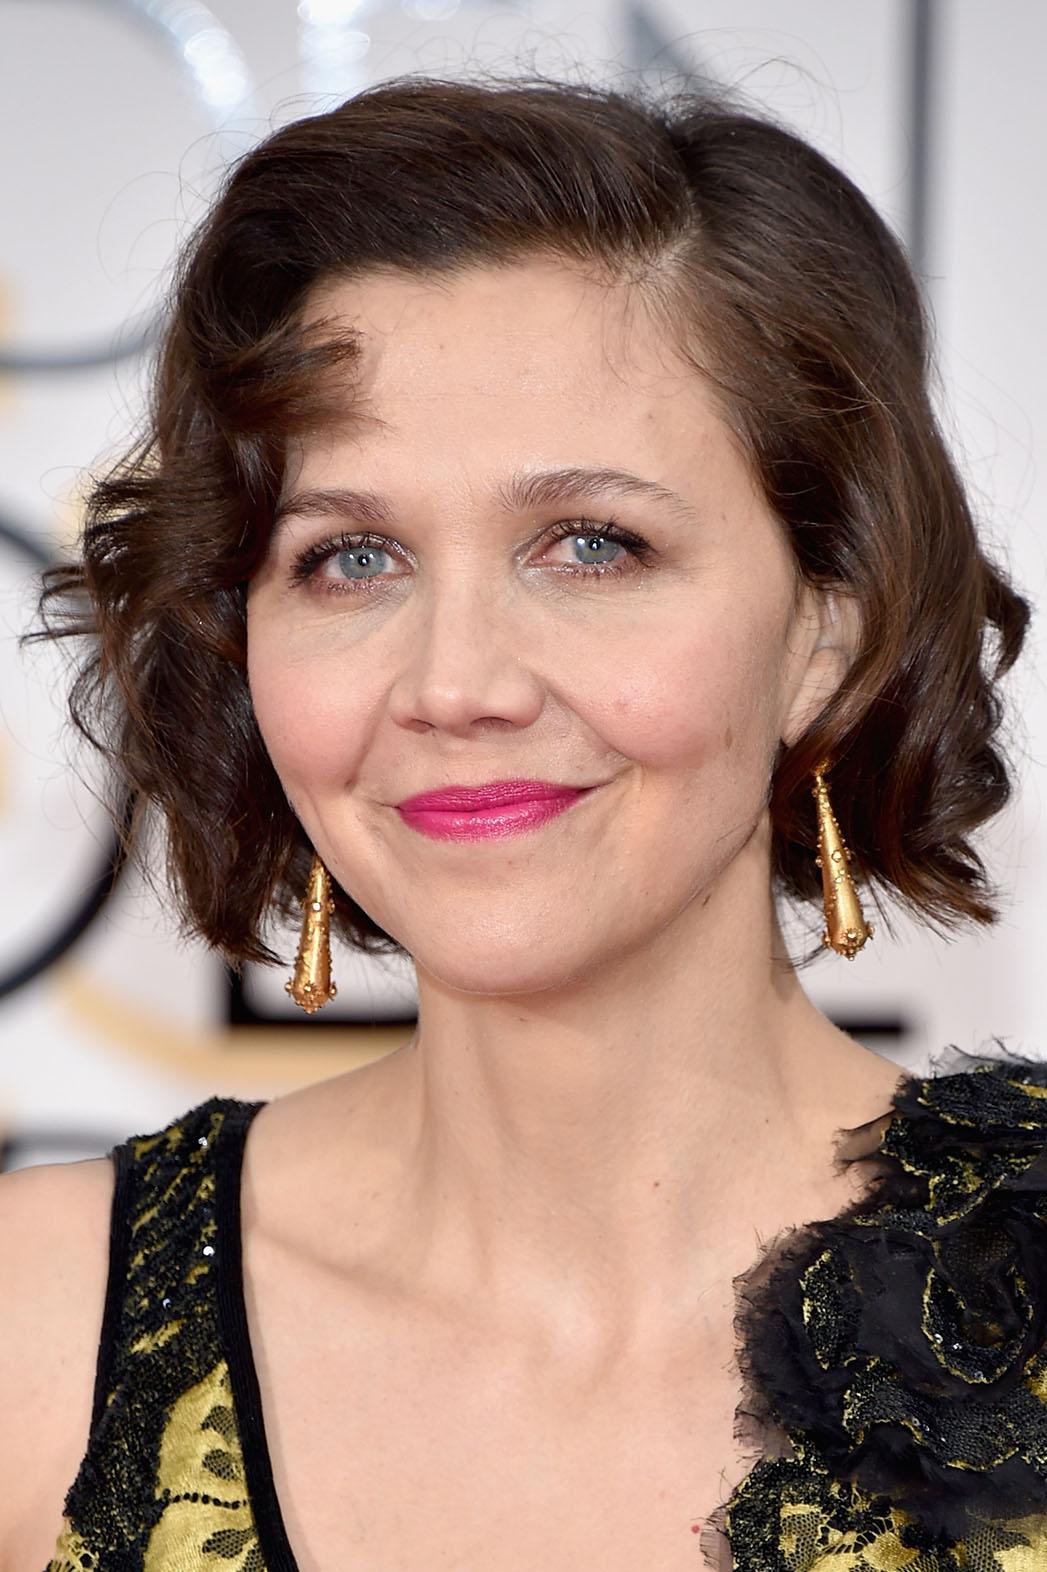 Maggie Gyllenhaal - P 2016